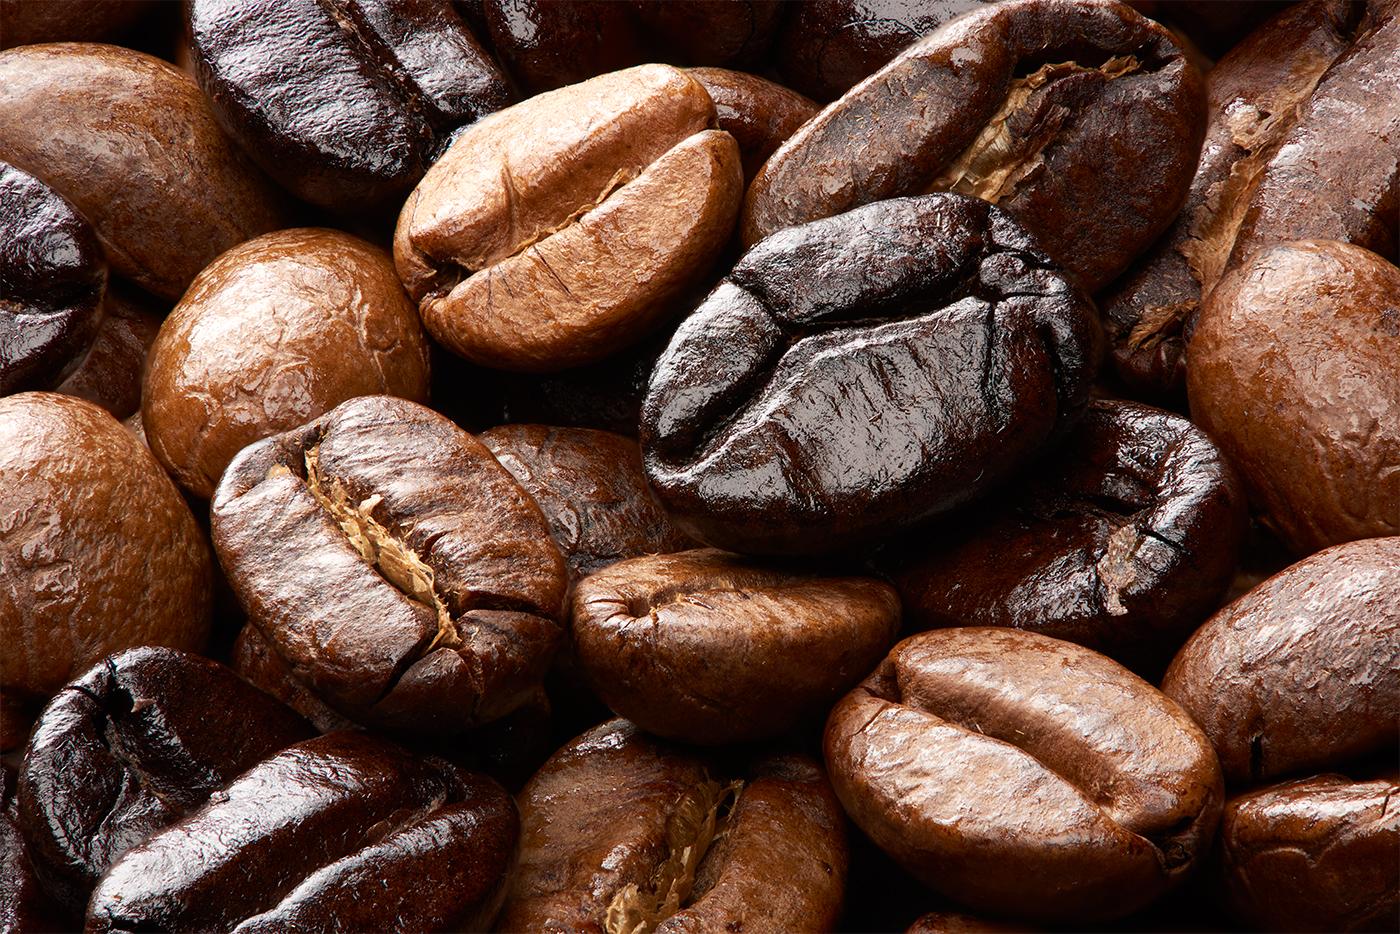 Coffee bean - Jamaican Blue Mountain Coffee